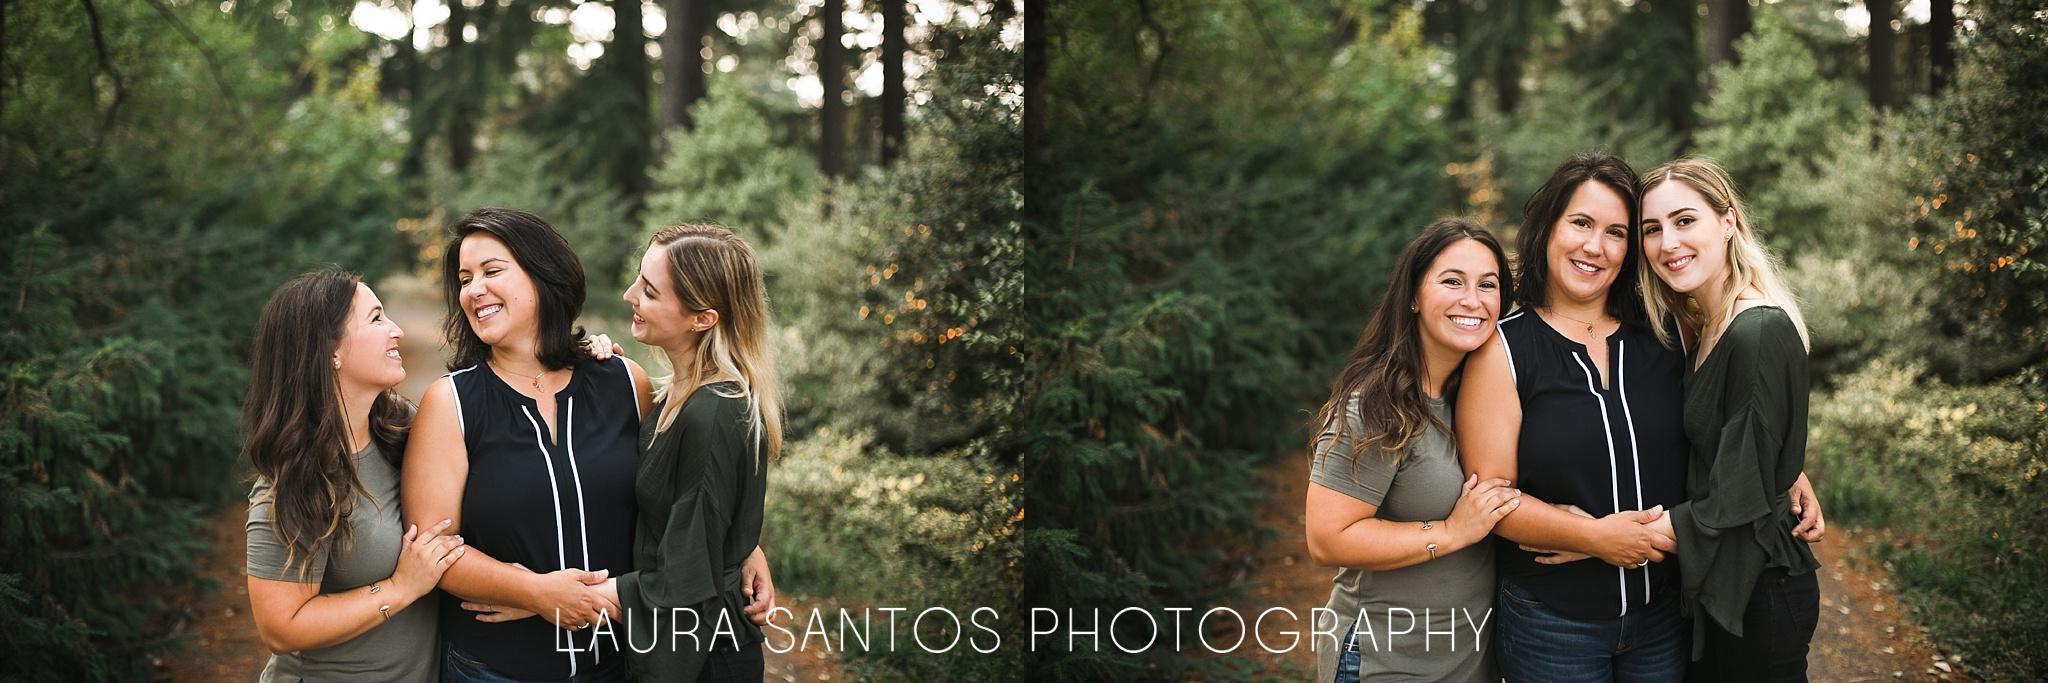 Laura Santos Photography Portland Oregon Family Photographer_0148.jpg